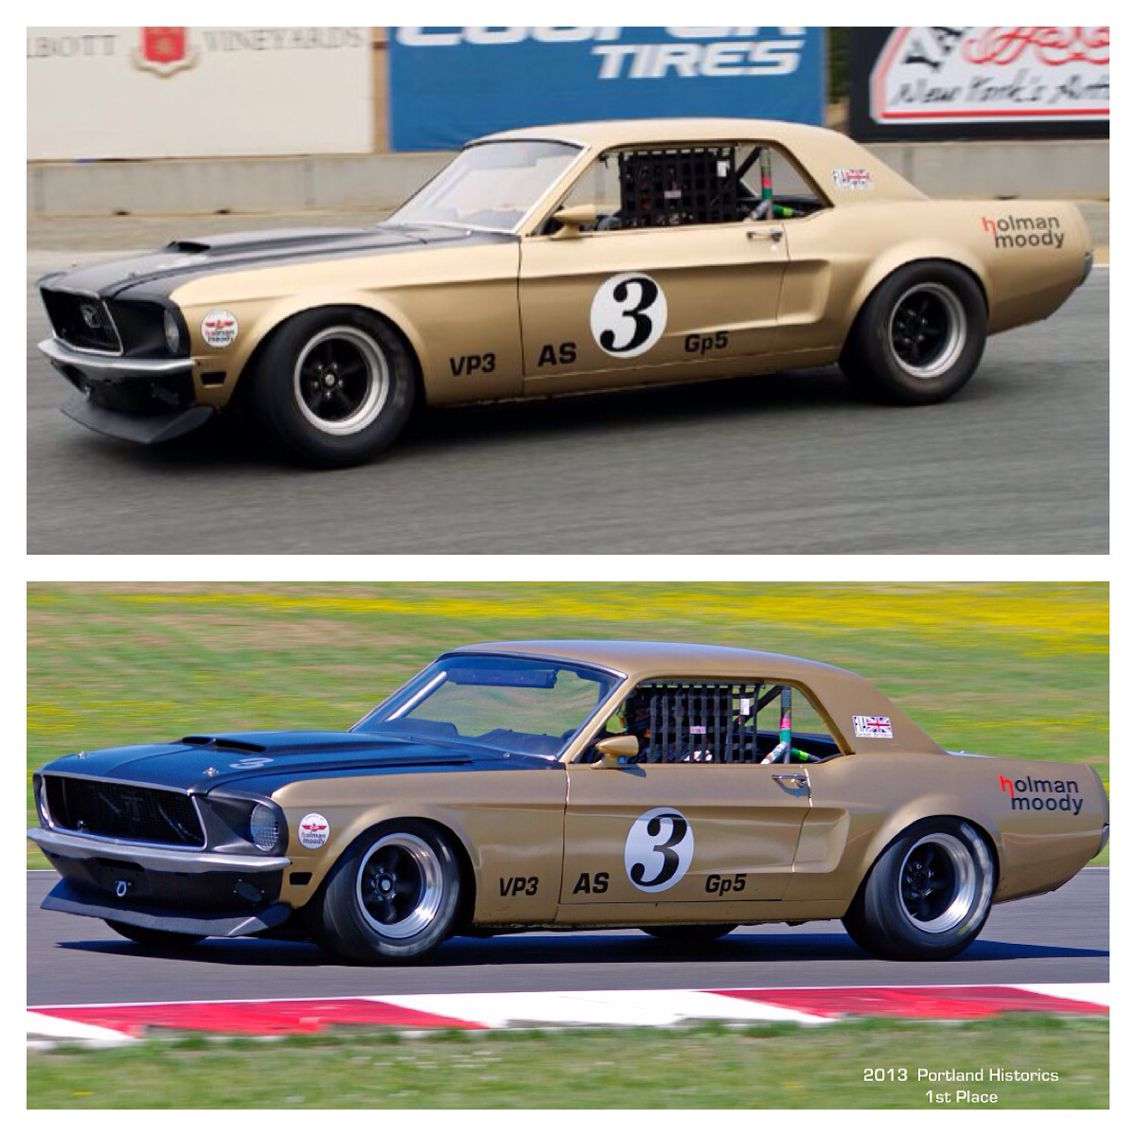 Holman moody built 3 road race 1968 mustang, each car had the same ...